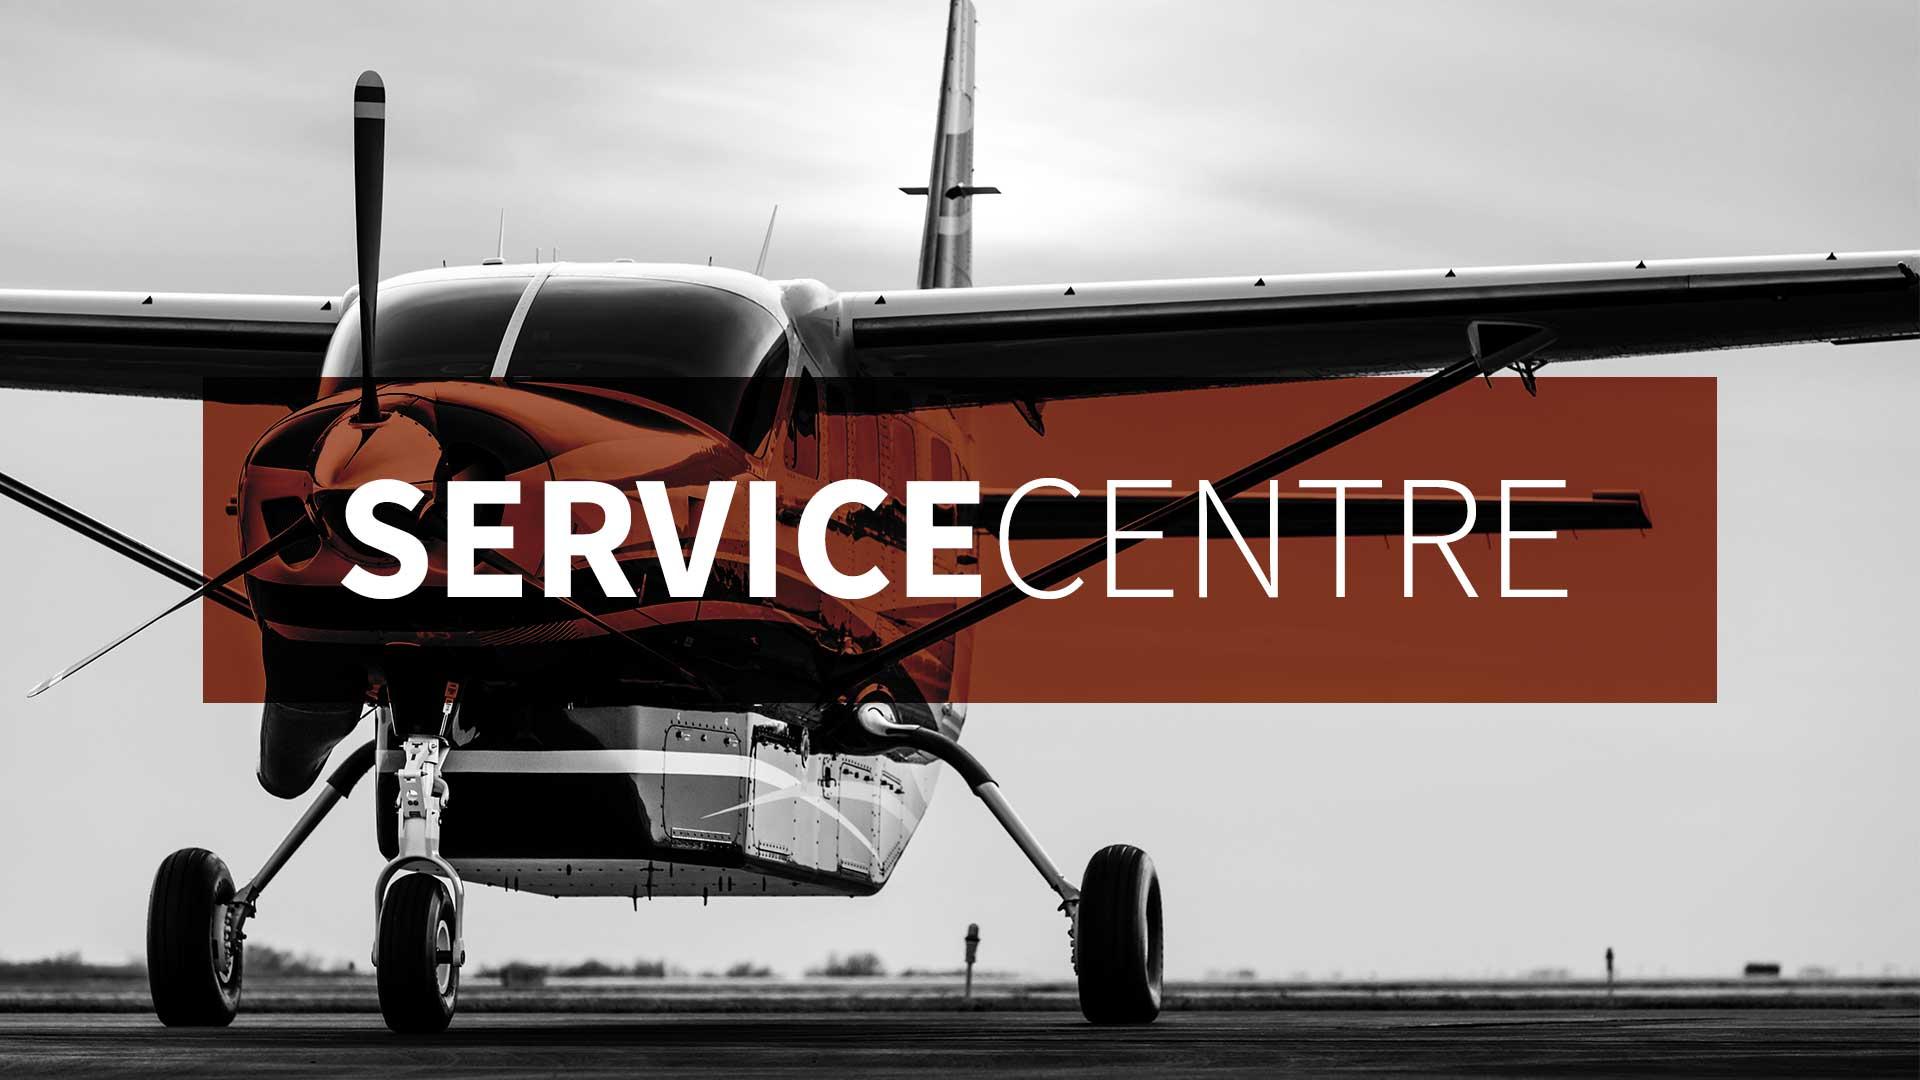 Web-banner-Service-Centre-20190205